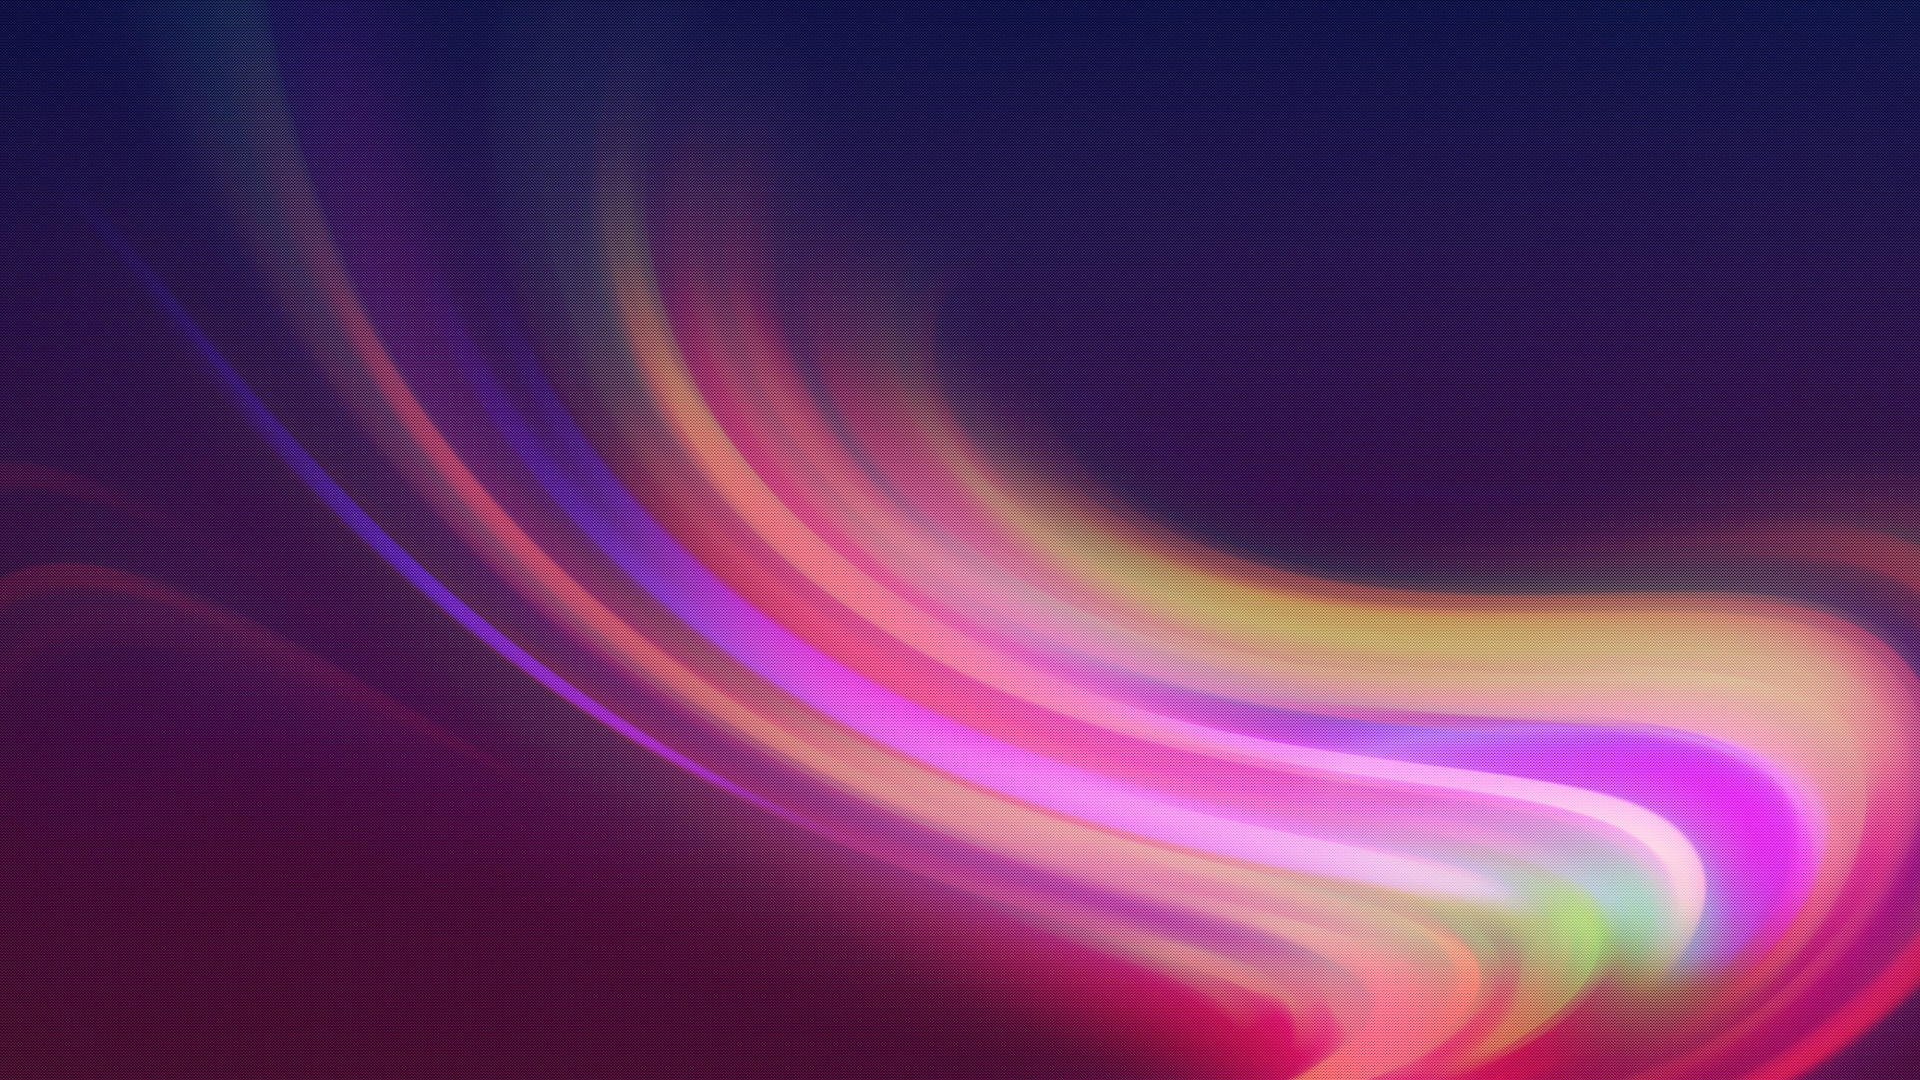 regenbogen muster bunte linien - photo #2